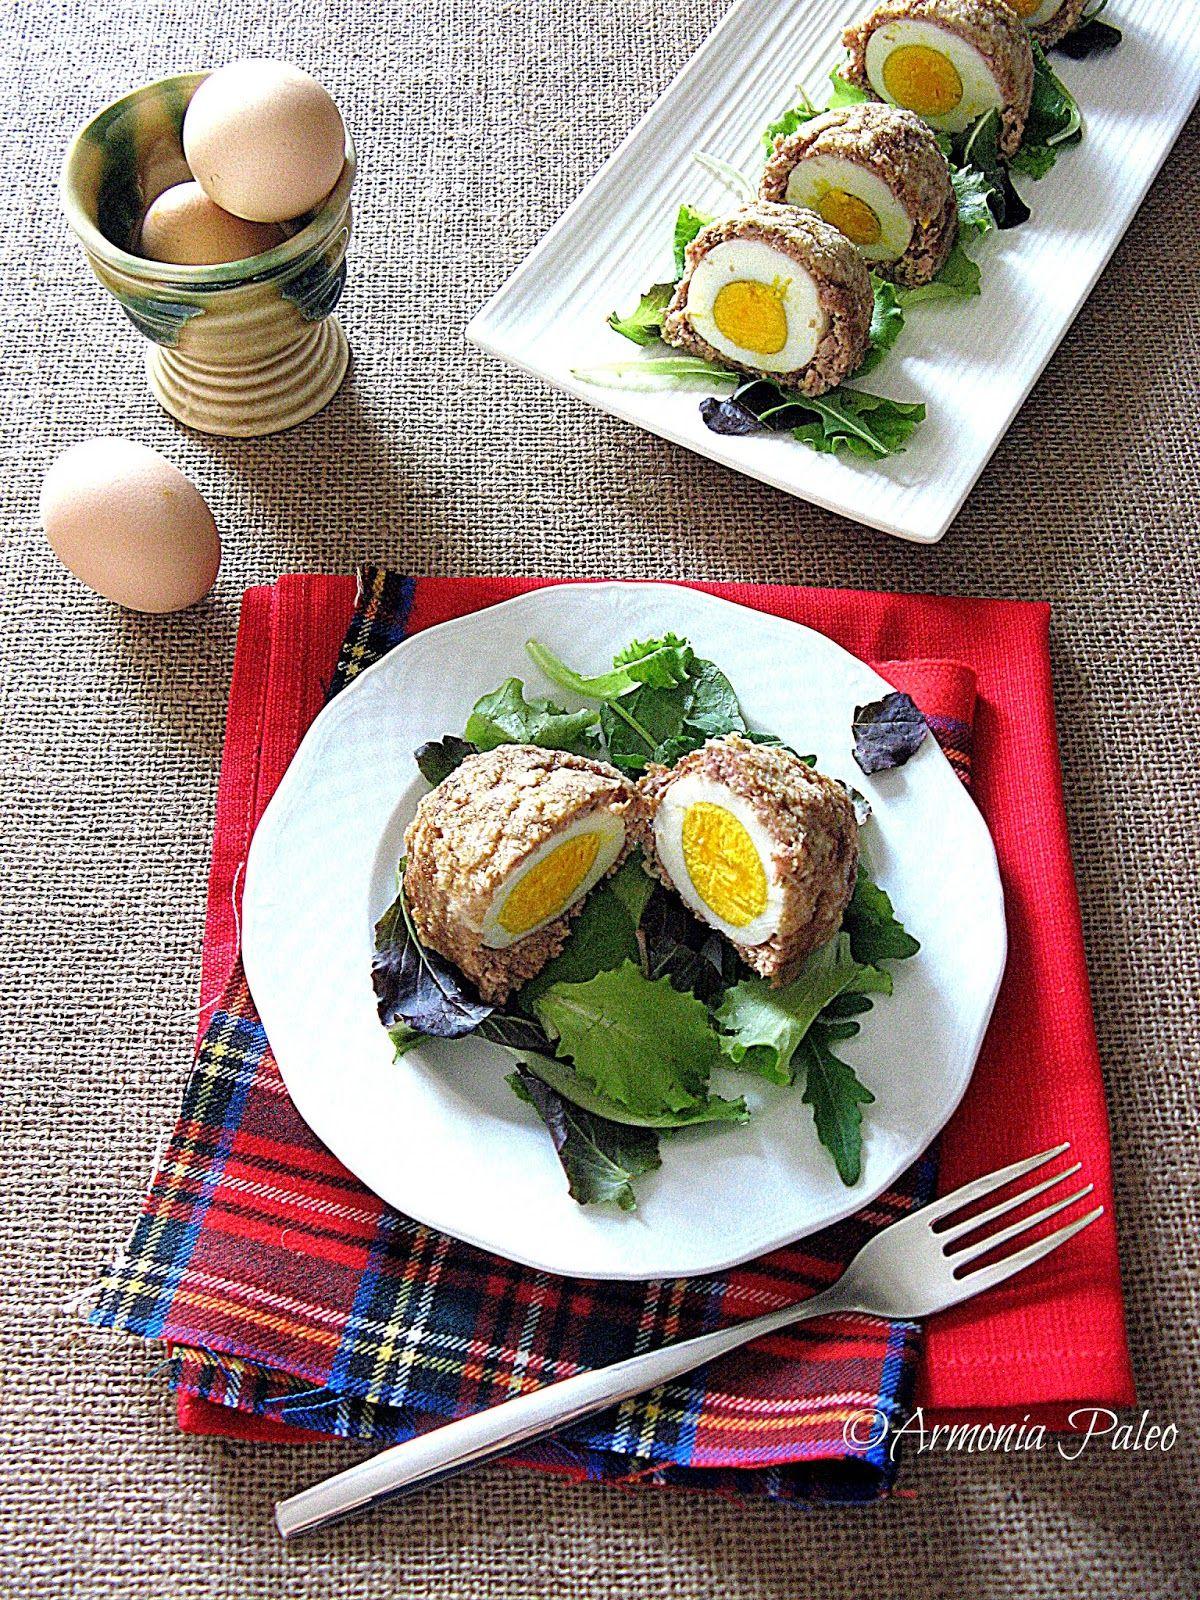 Armonia Paleo: Scotch Eggs - Uova Scozzesi